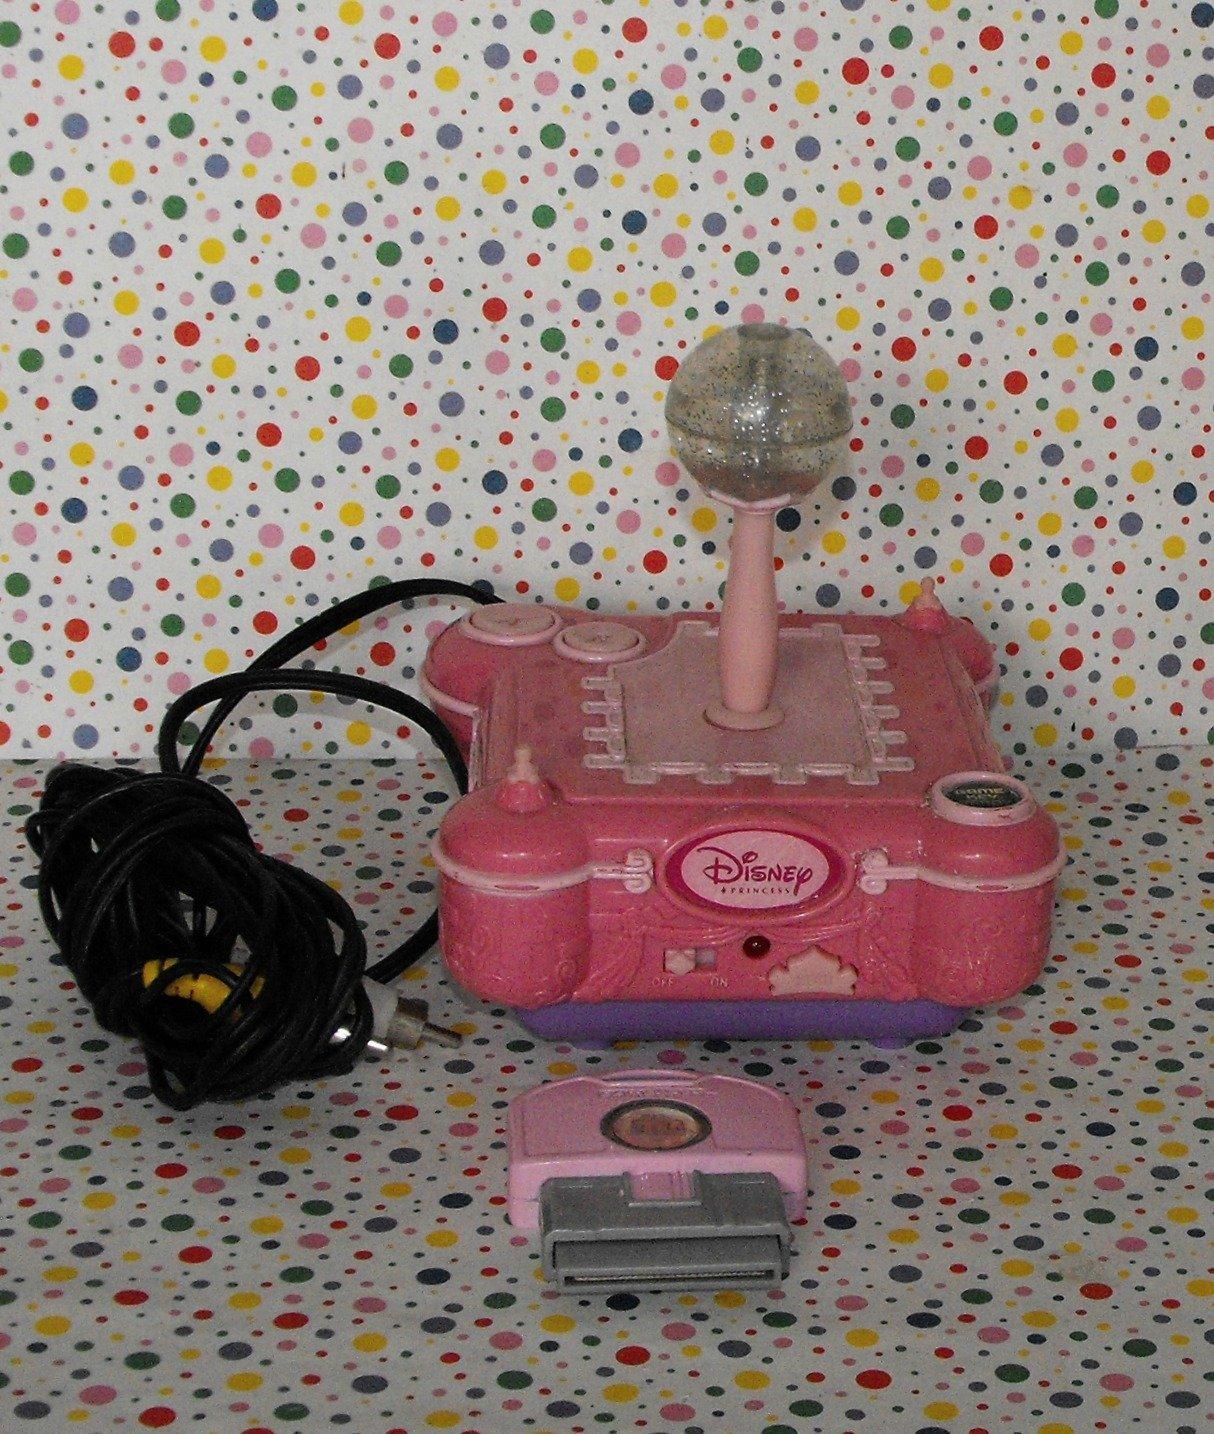 Jakks Pacific Disney Princesses Plug and Play AV Video Game